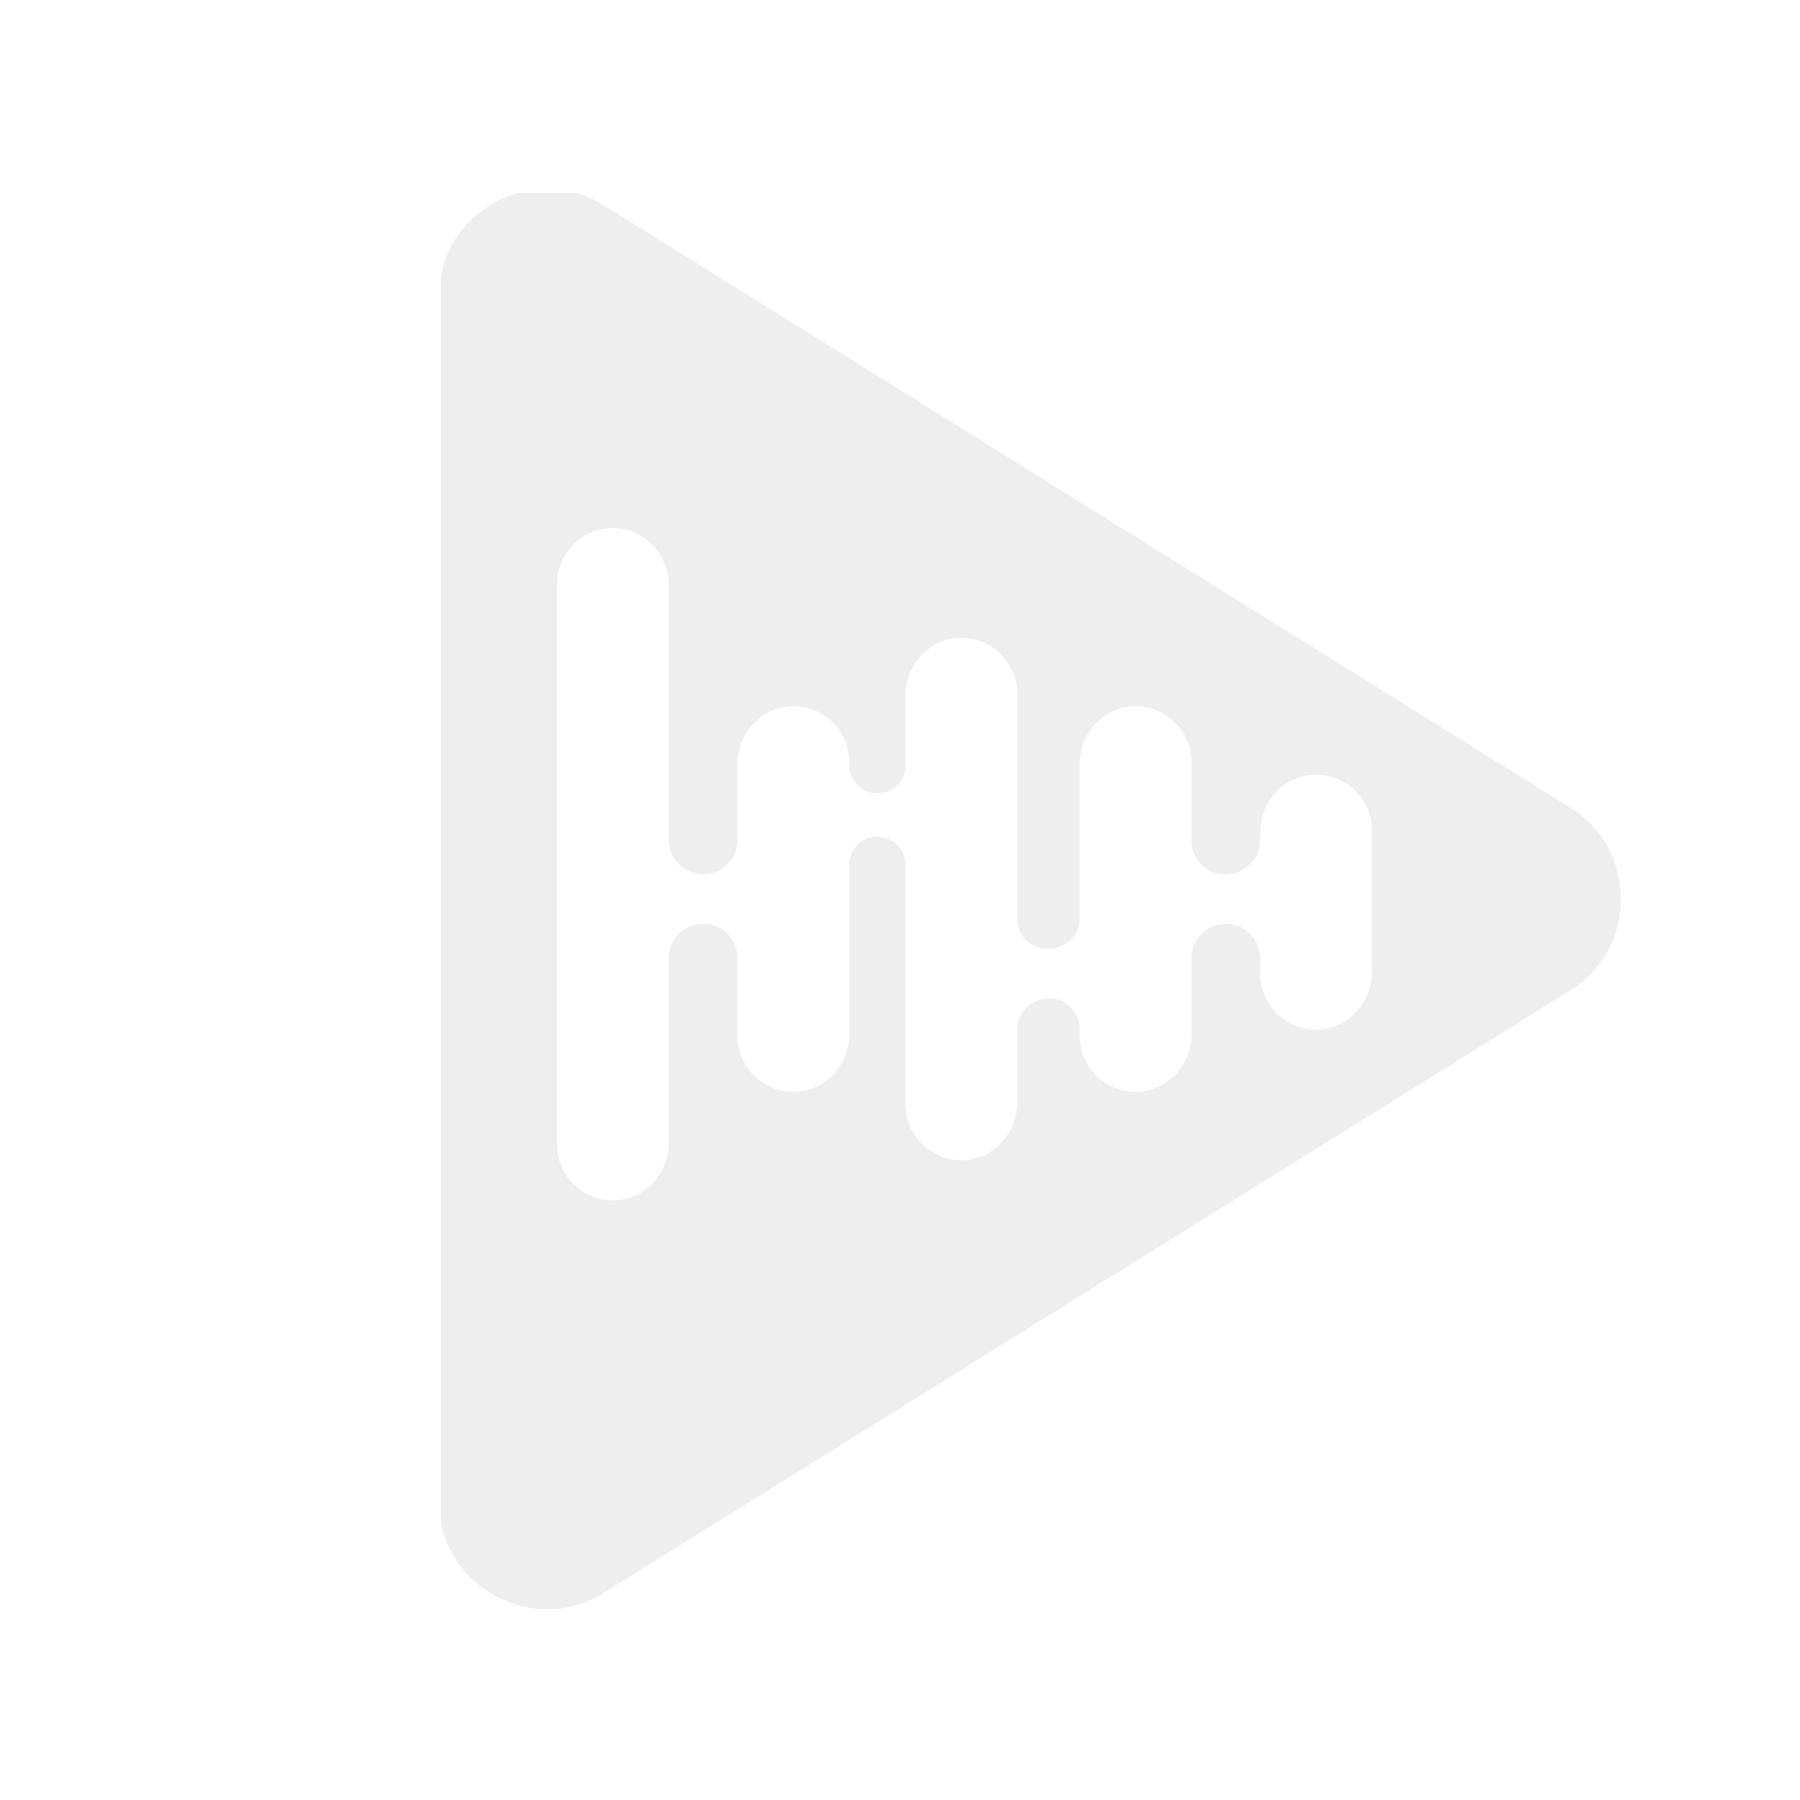 Audison APBMW-F45-HIFI